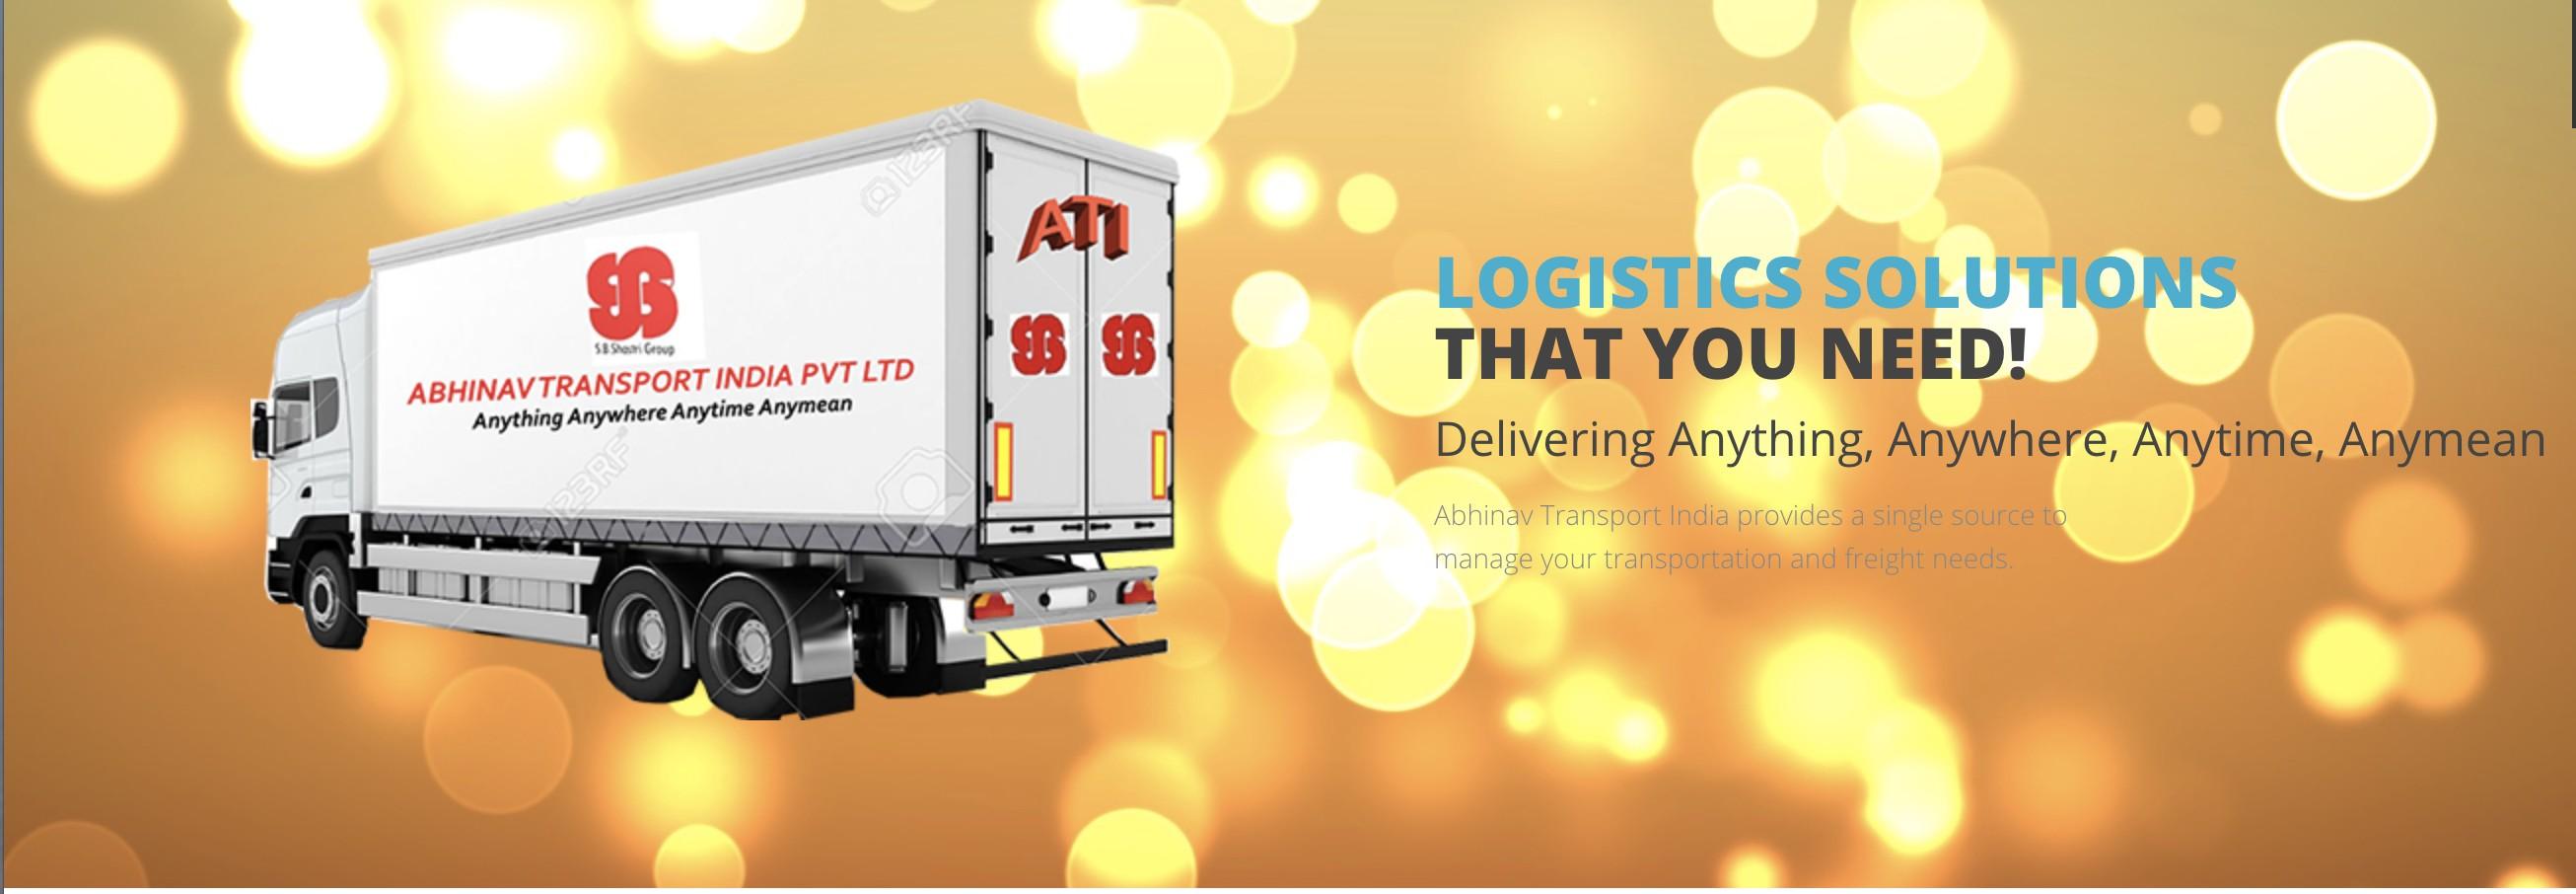 Ags Logistics Pvt Ltd abhinav transport (india) pvt ltd | linkedin